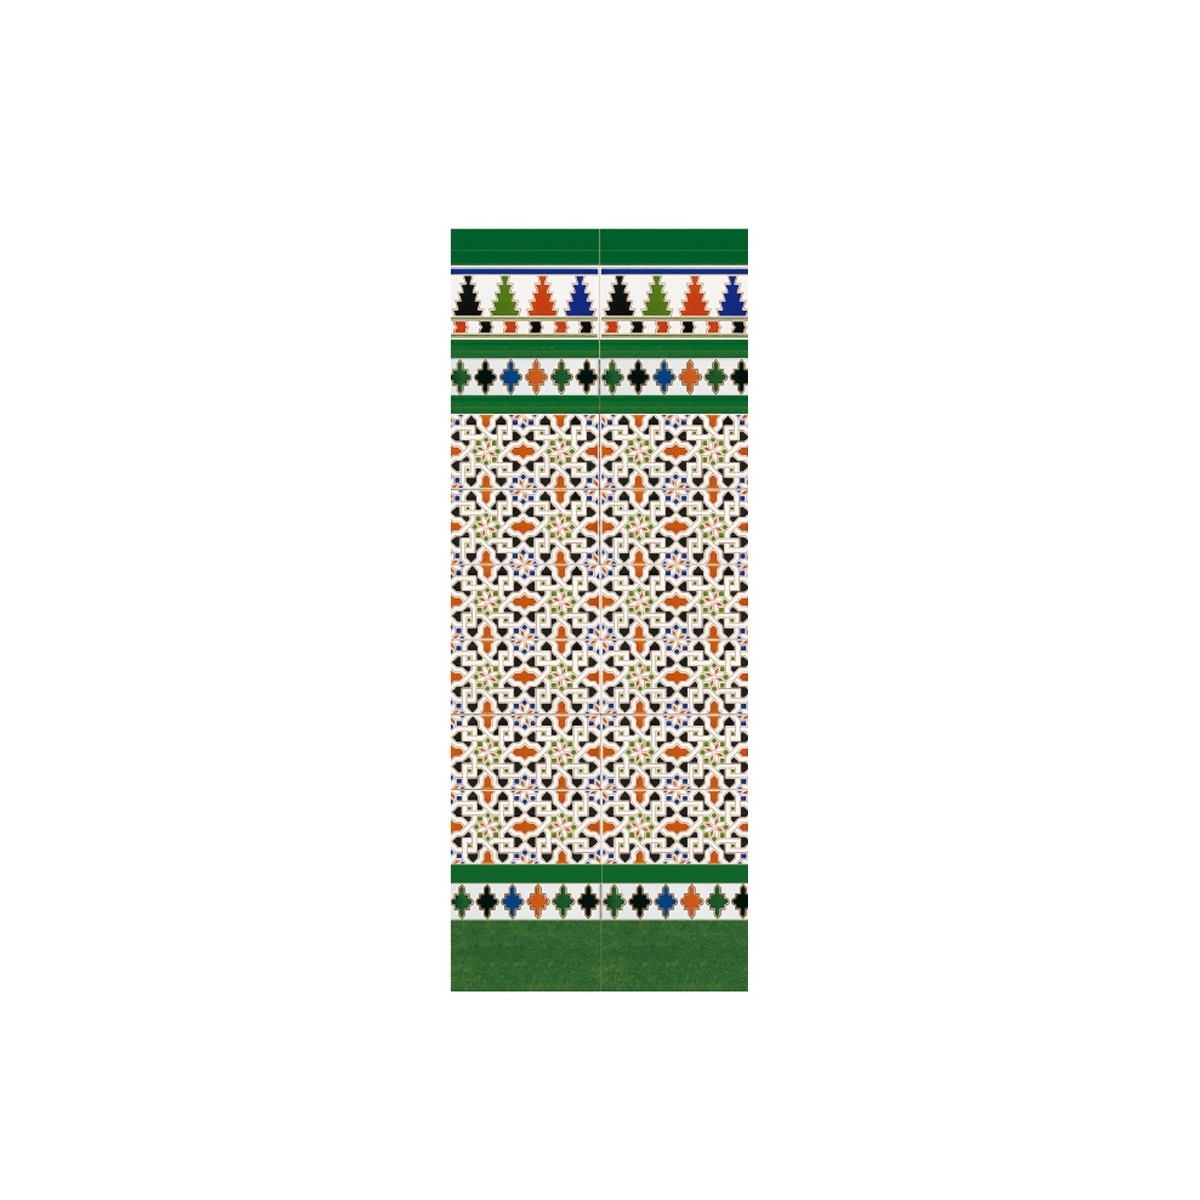 Tira relieve verde 3x28 (ud) - Serie Alhambra - Marca Mainzu